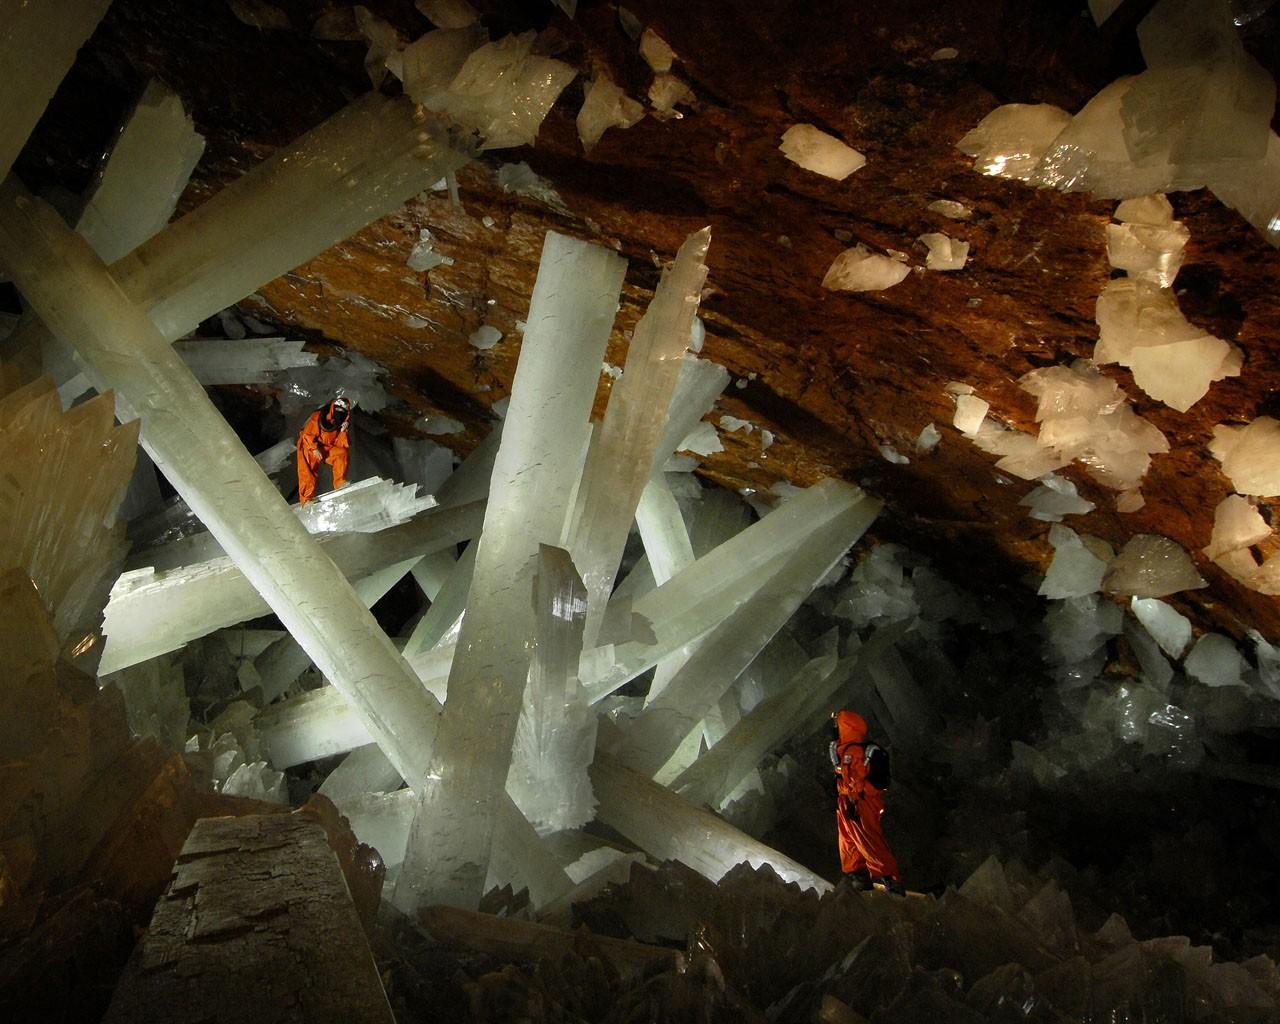 2 Crystal Caverns, Mexico